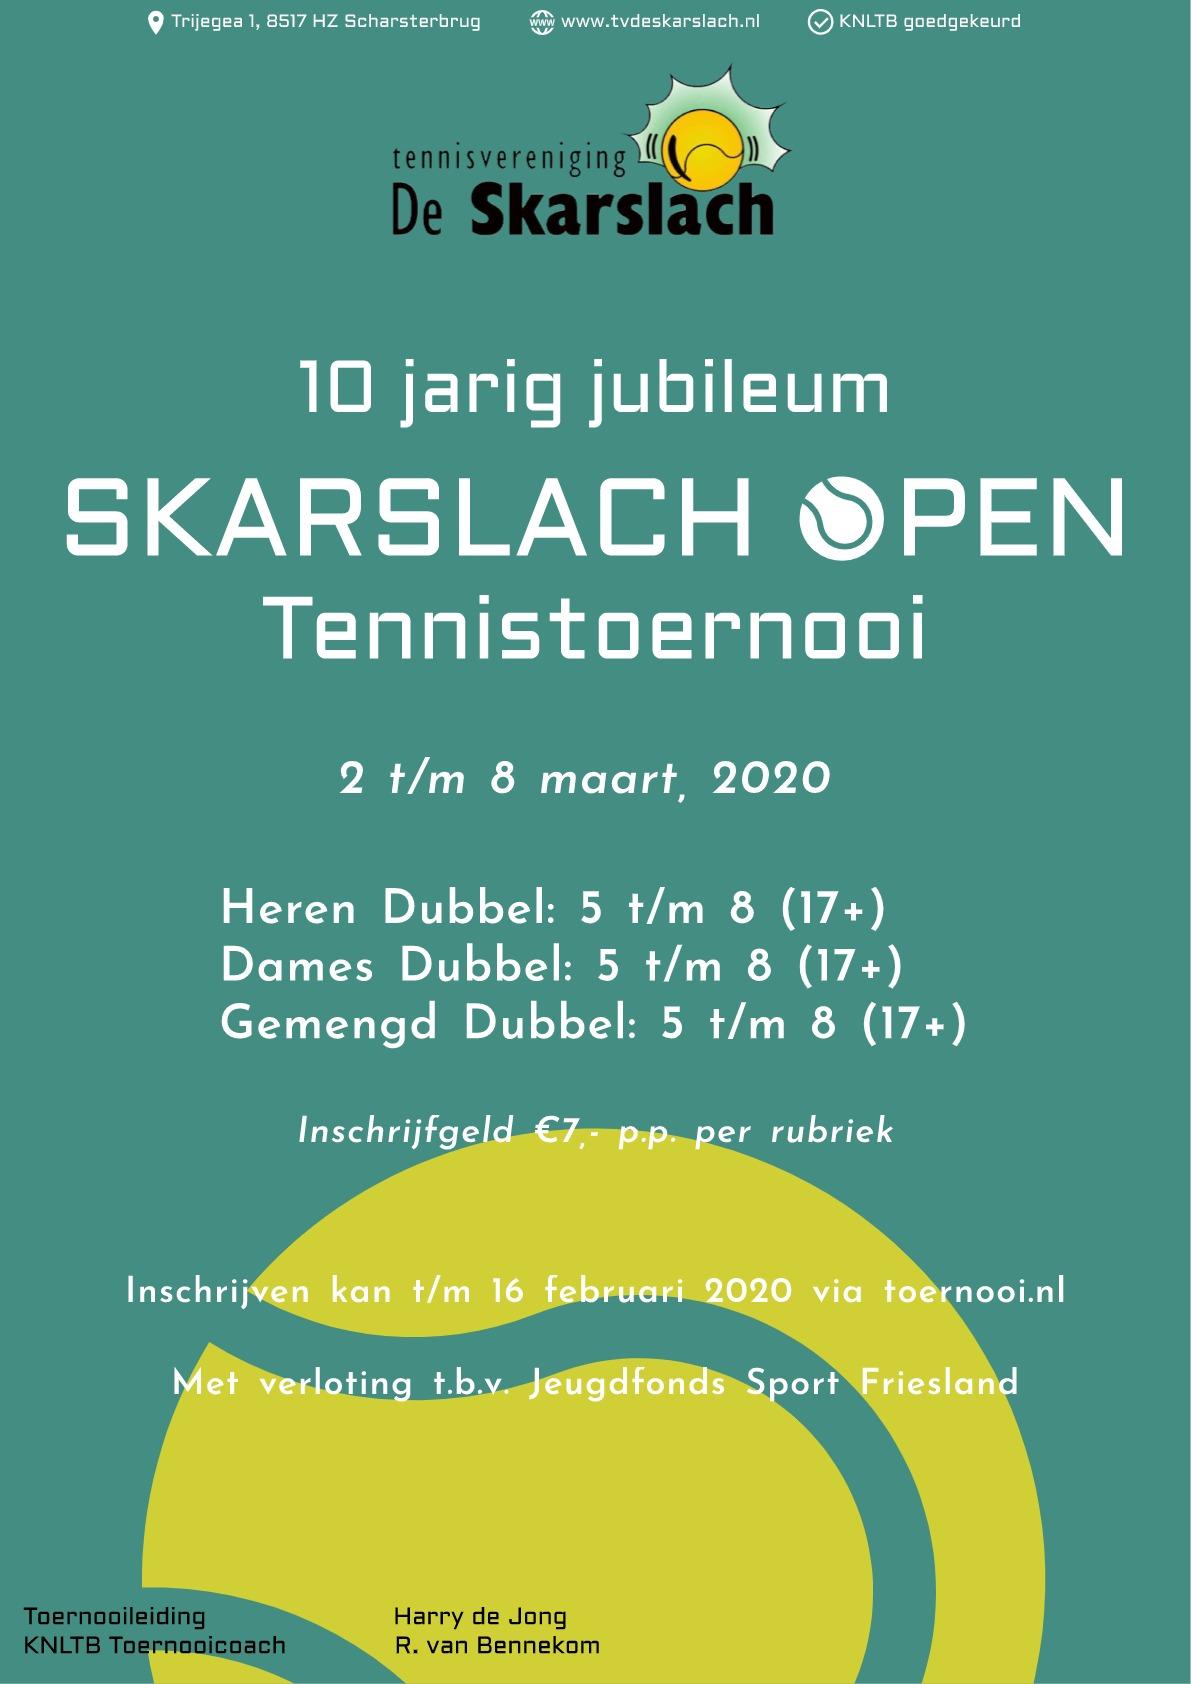 Skarslach Open 2020